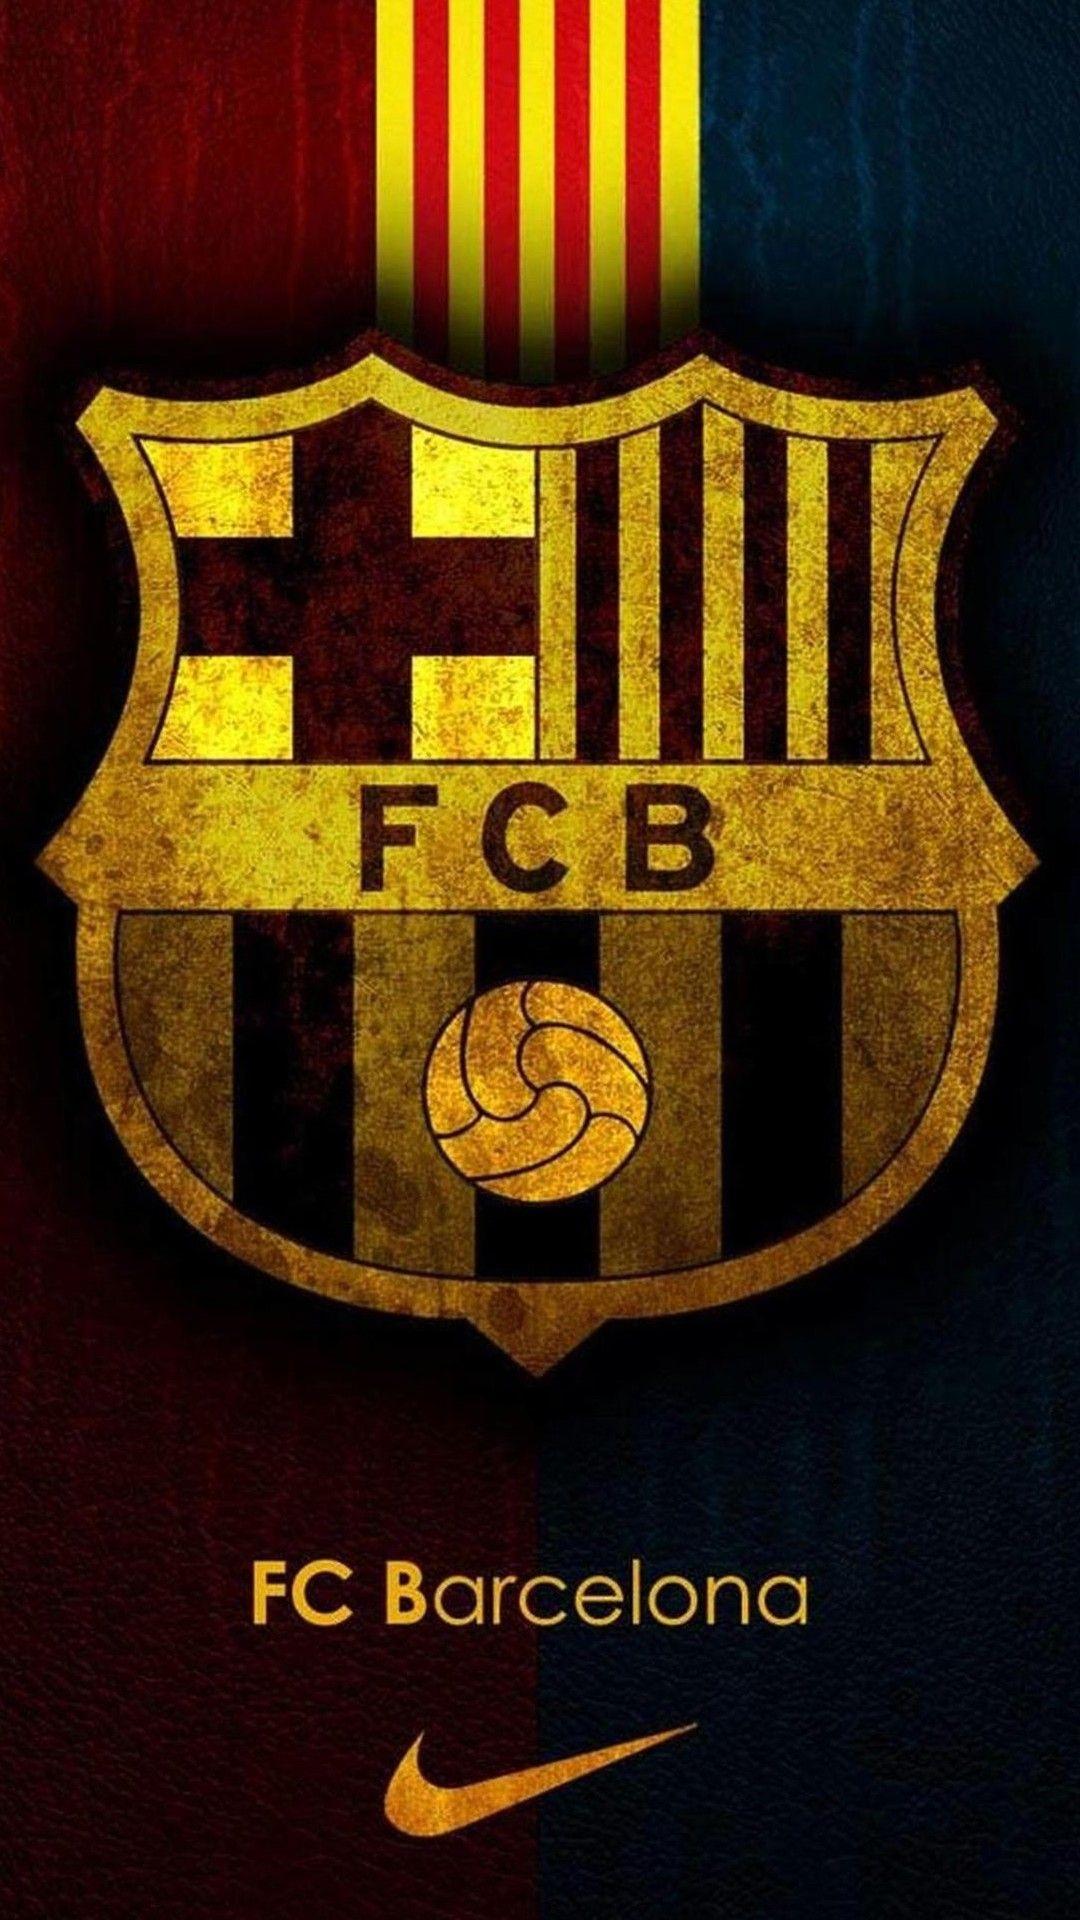 Fcバルセロナ メッシ 壁紙 Fcバルセロナ サッカーの壁紙